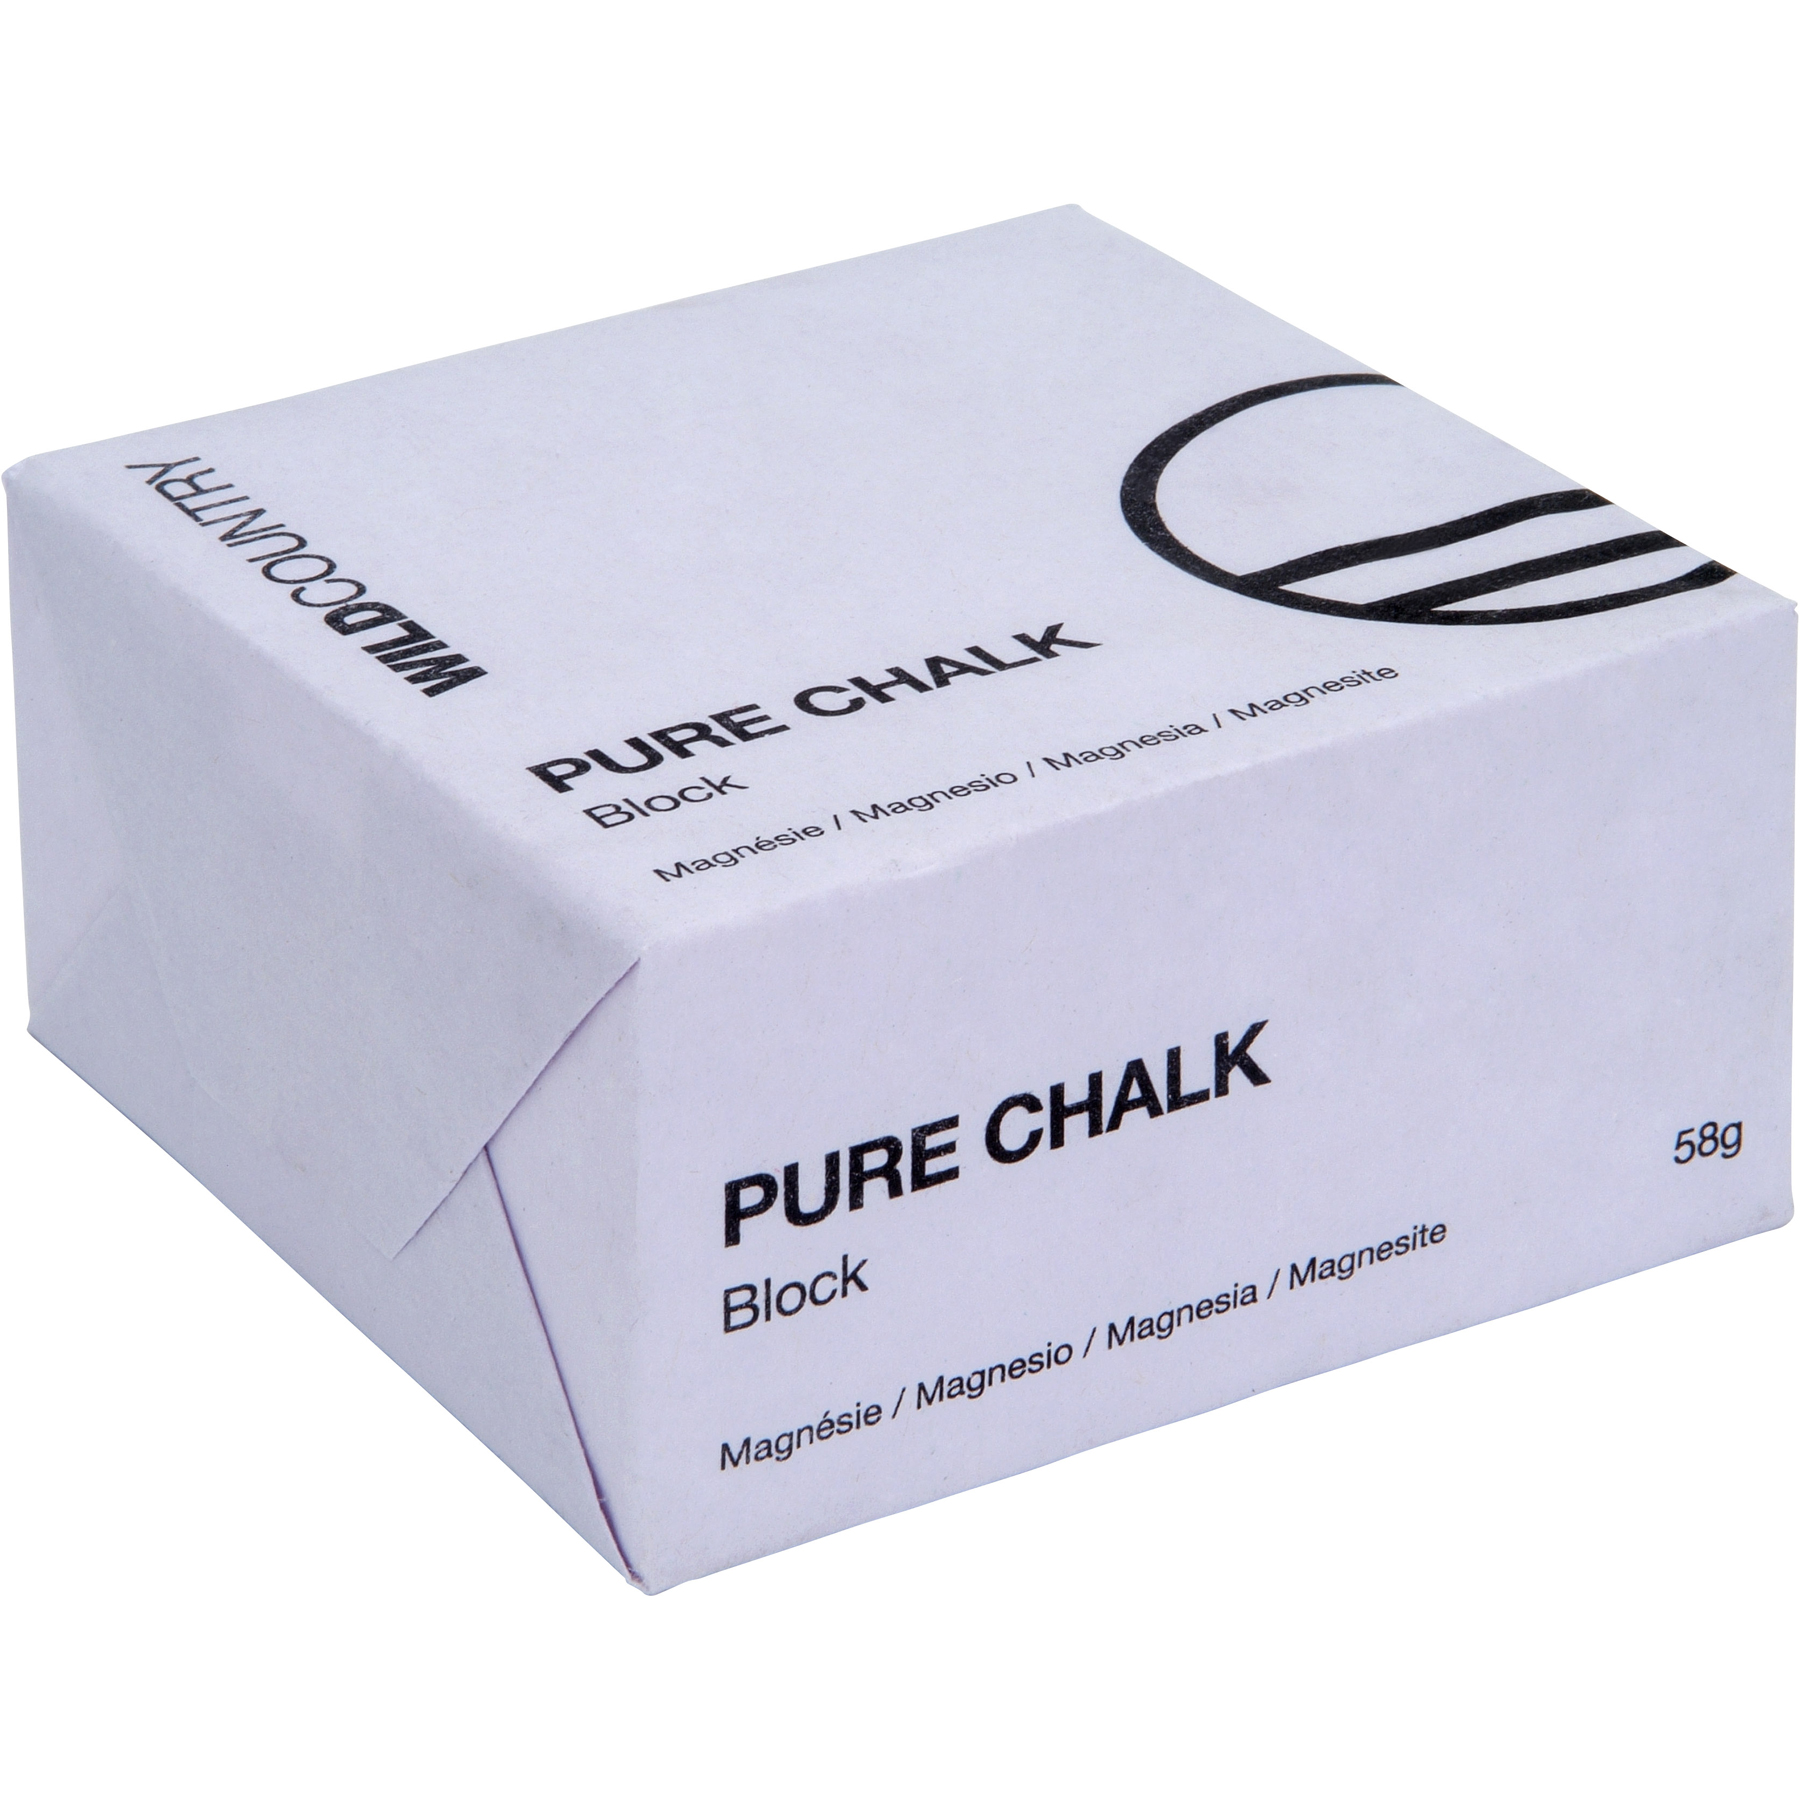 Wild Country Pure Chalk Block 58g Magnesiumblock - Uni